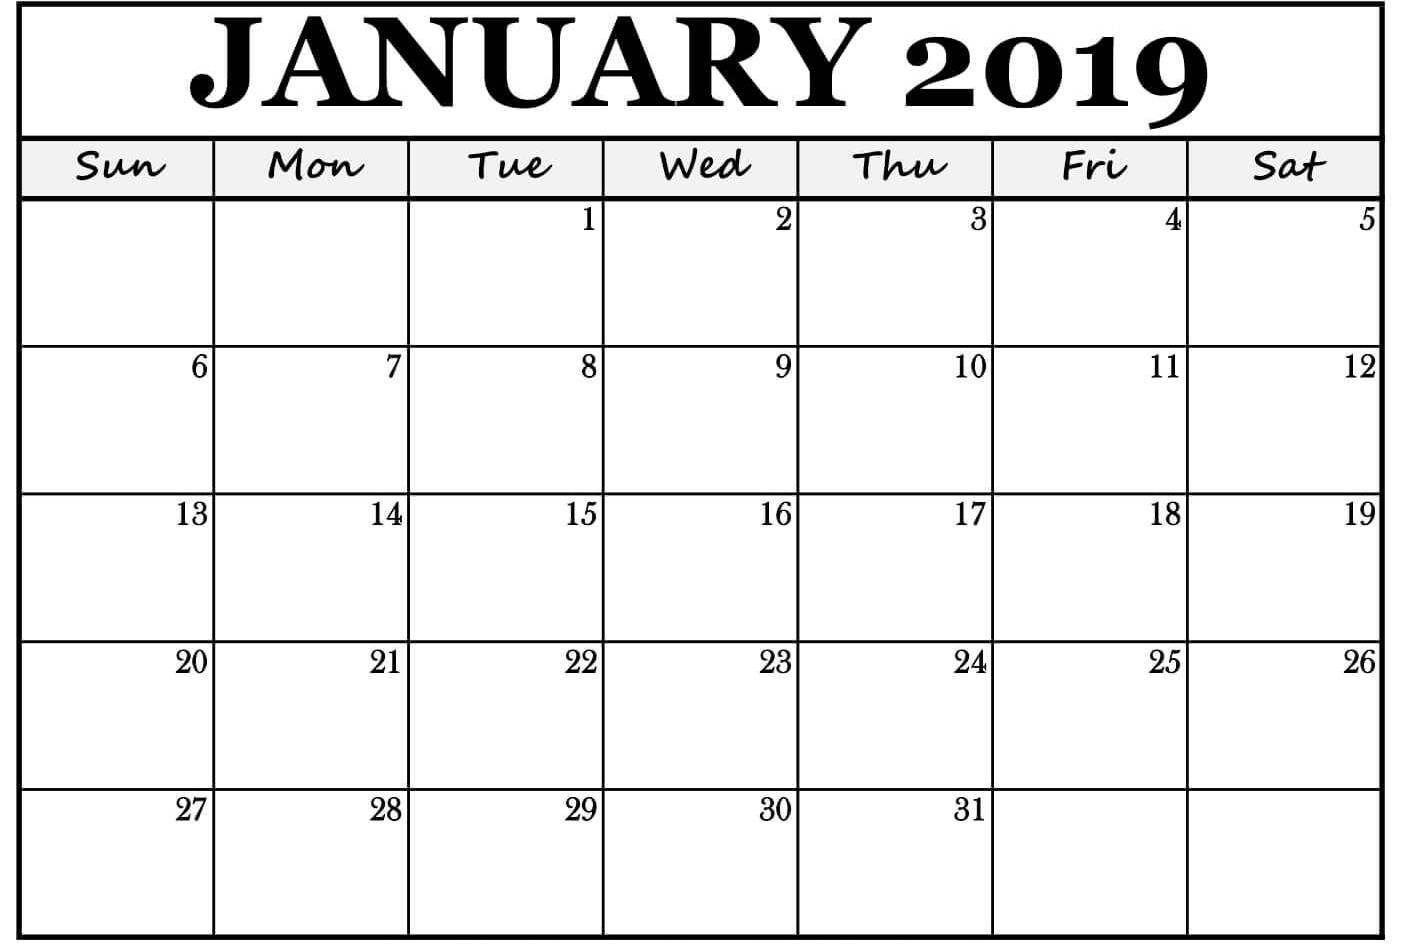 Print January 2019 Calendar Pdf Word Excel Portrait And Landscape